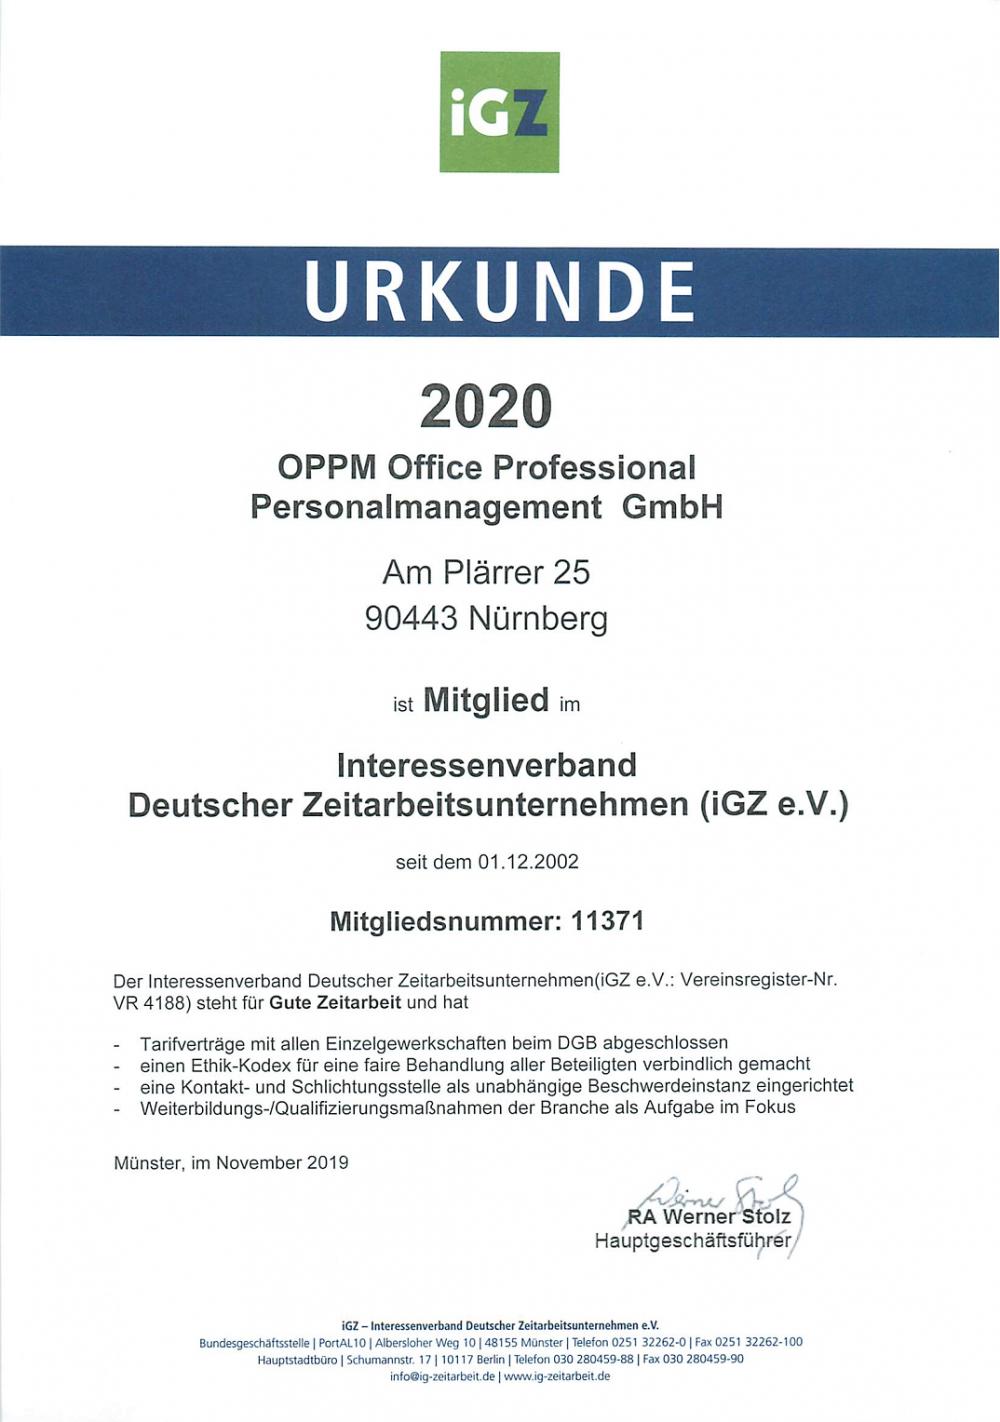 IGZ Mitgliedsurkunde 2020